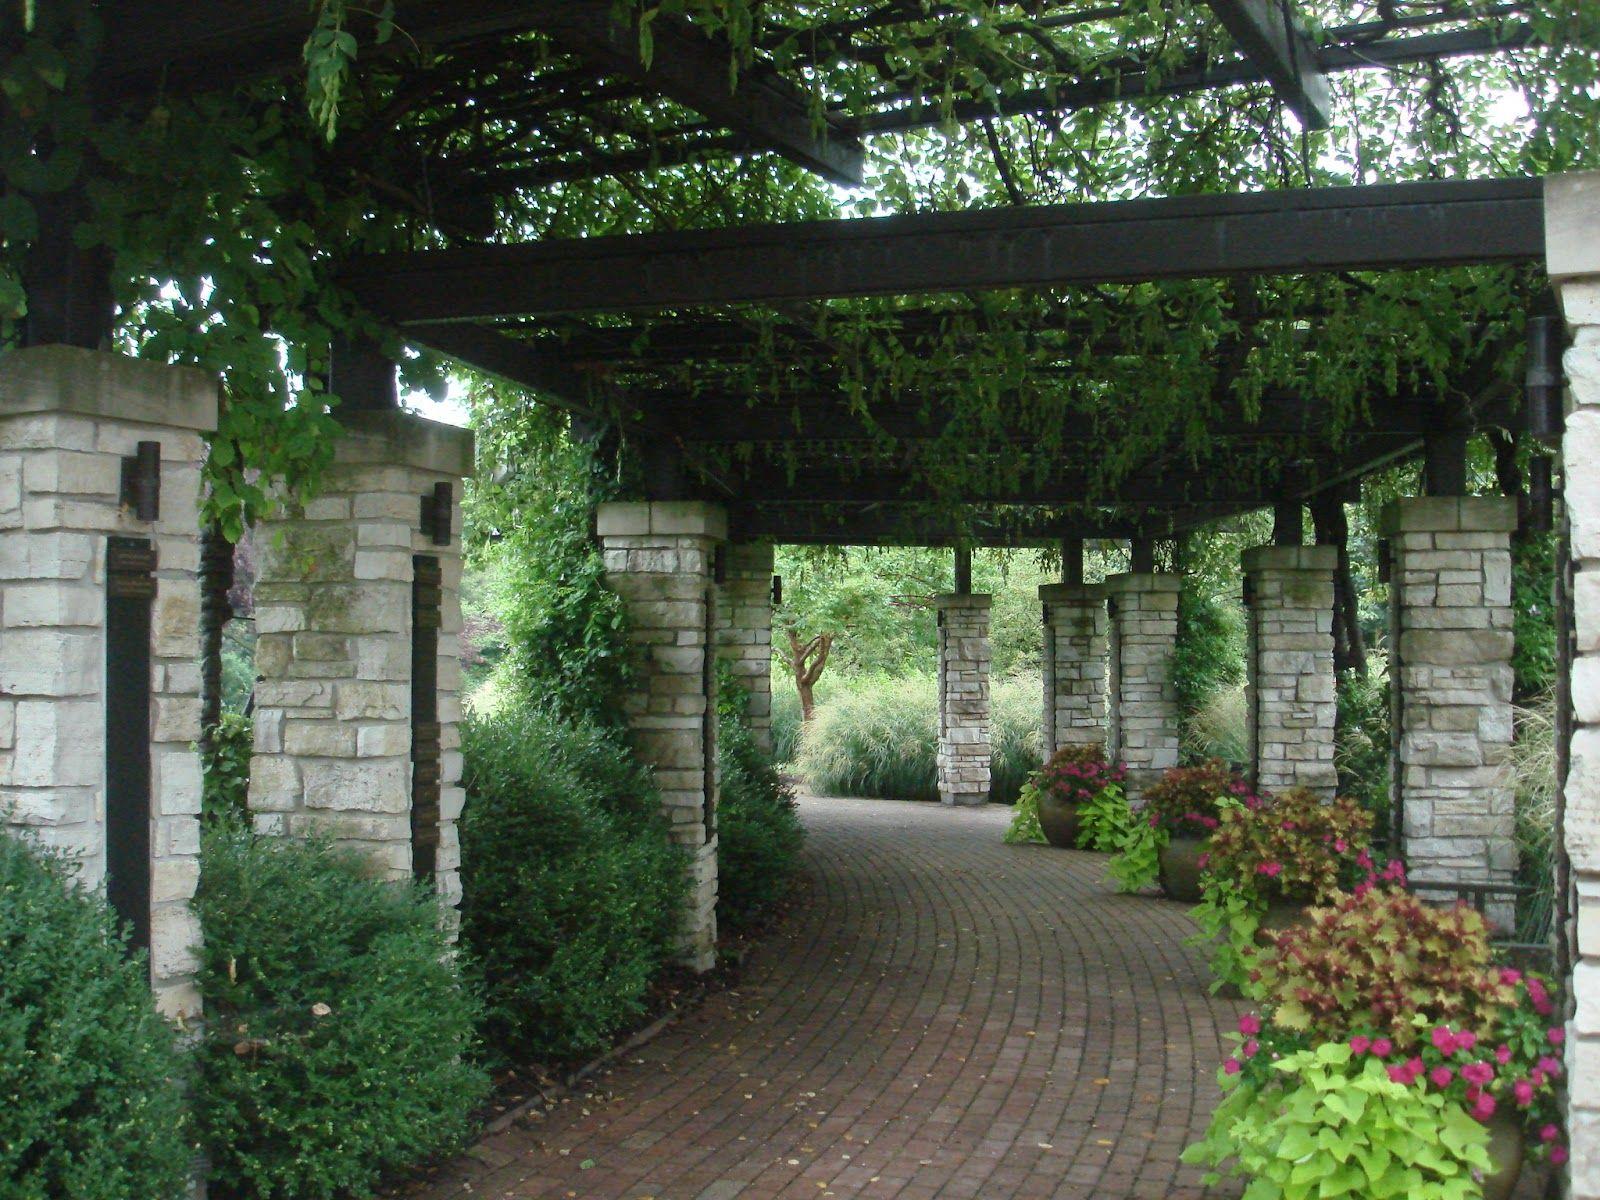 44d1c5622b49dc3a422e9171430bd37c - Olbrich Botanical Gardens 3330 Atwood Avenue Madison Wi 53704